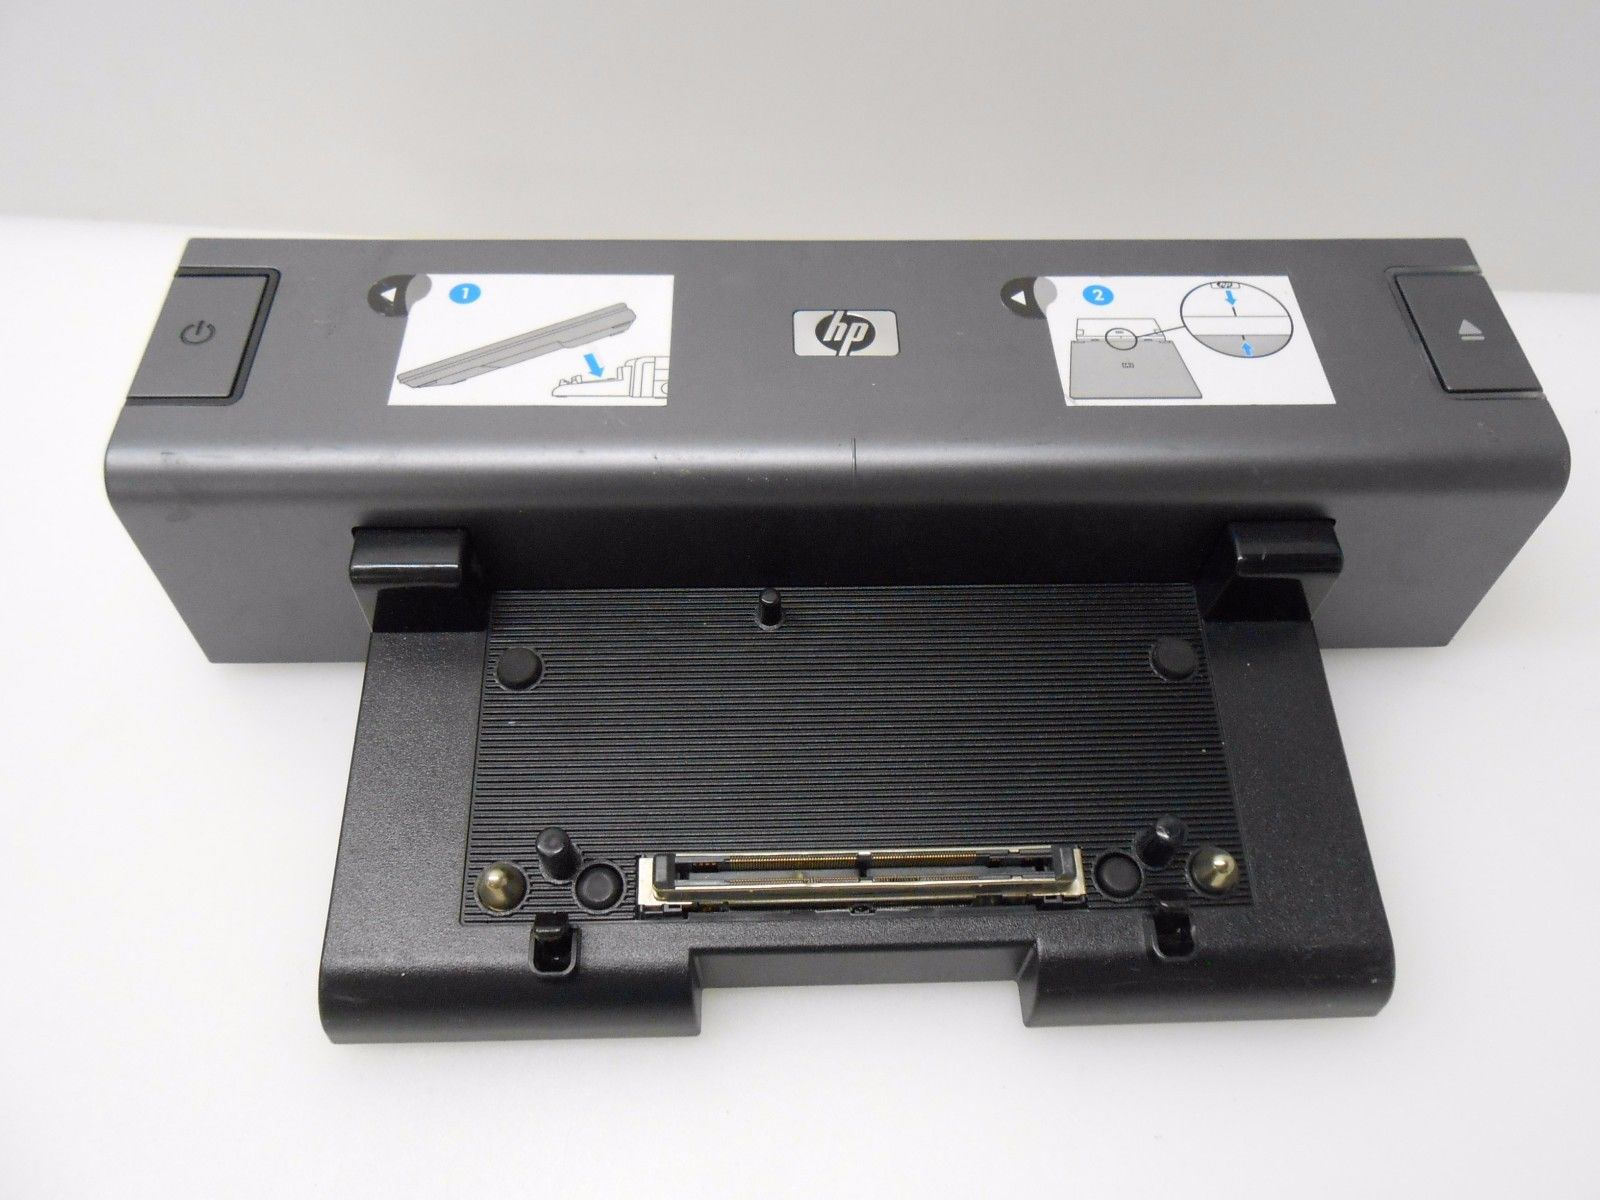 HP Compaq 8710w Mobile Workstation Universal PostScript Print Driver for Windows